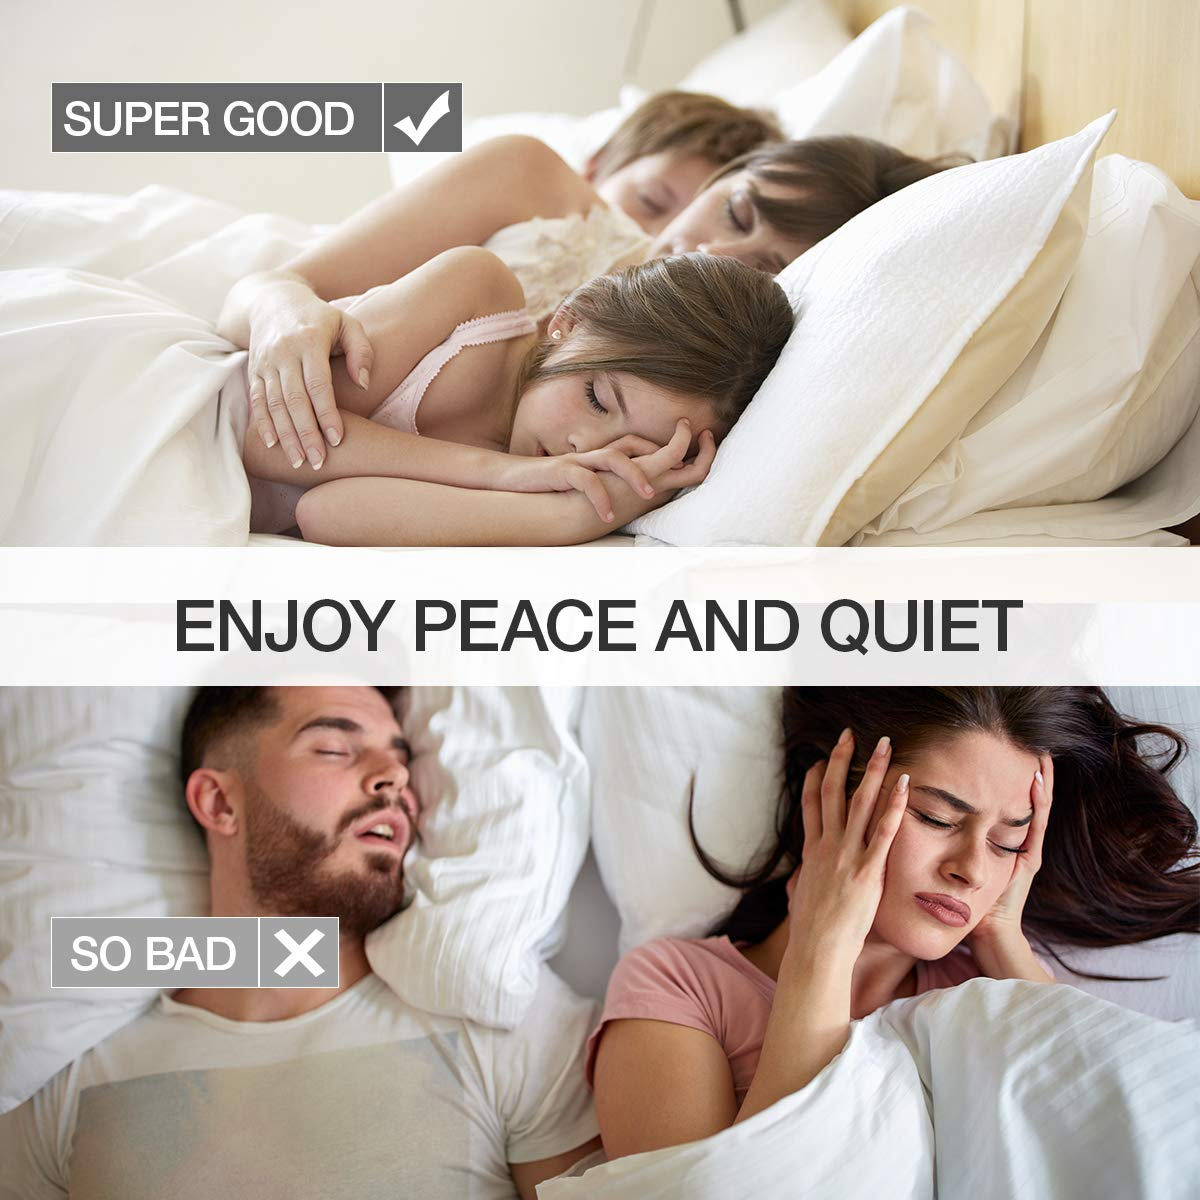 Soft Foam Ear Plugs 80 Pairs Earplugs - 34dB Highest NRR , Comfortable Ear Plugs for Sleeping, Snoring, Work, Travel & Loud Events